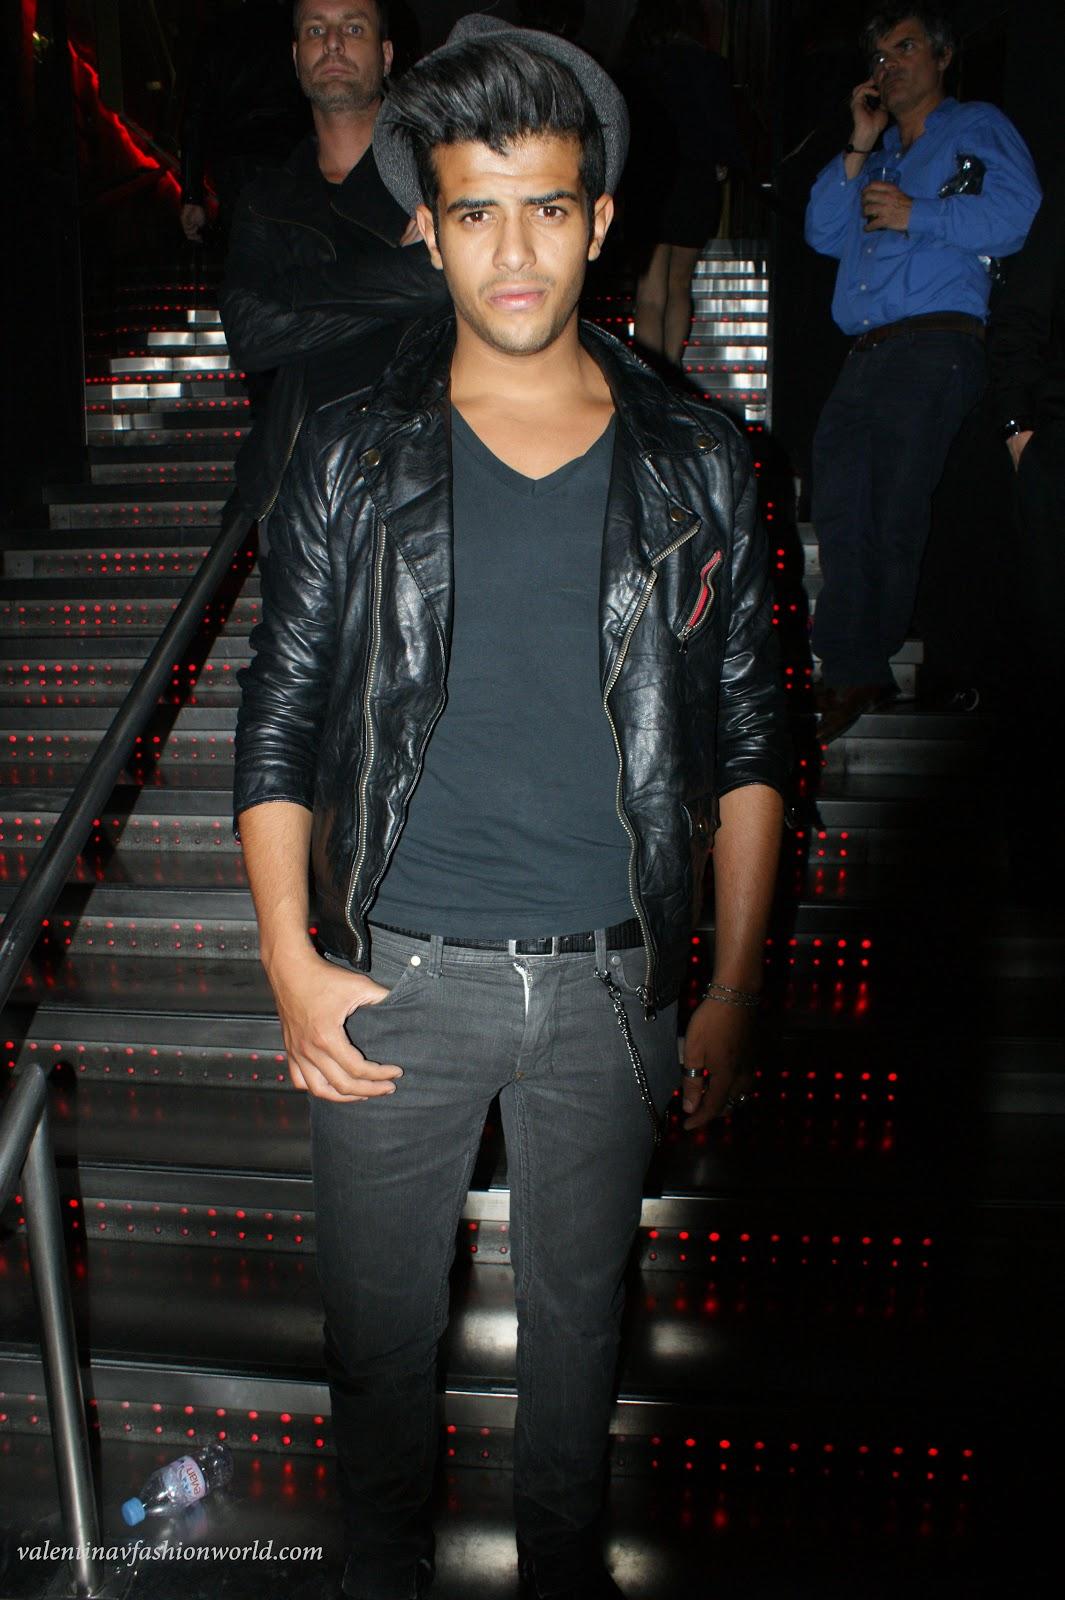 TOP 10 MEN OUTFIT AT THE MARANGONI PARTY PARIS - V Fashion ...